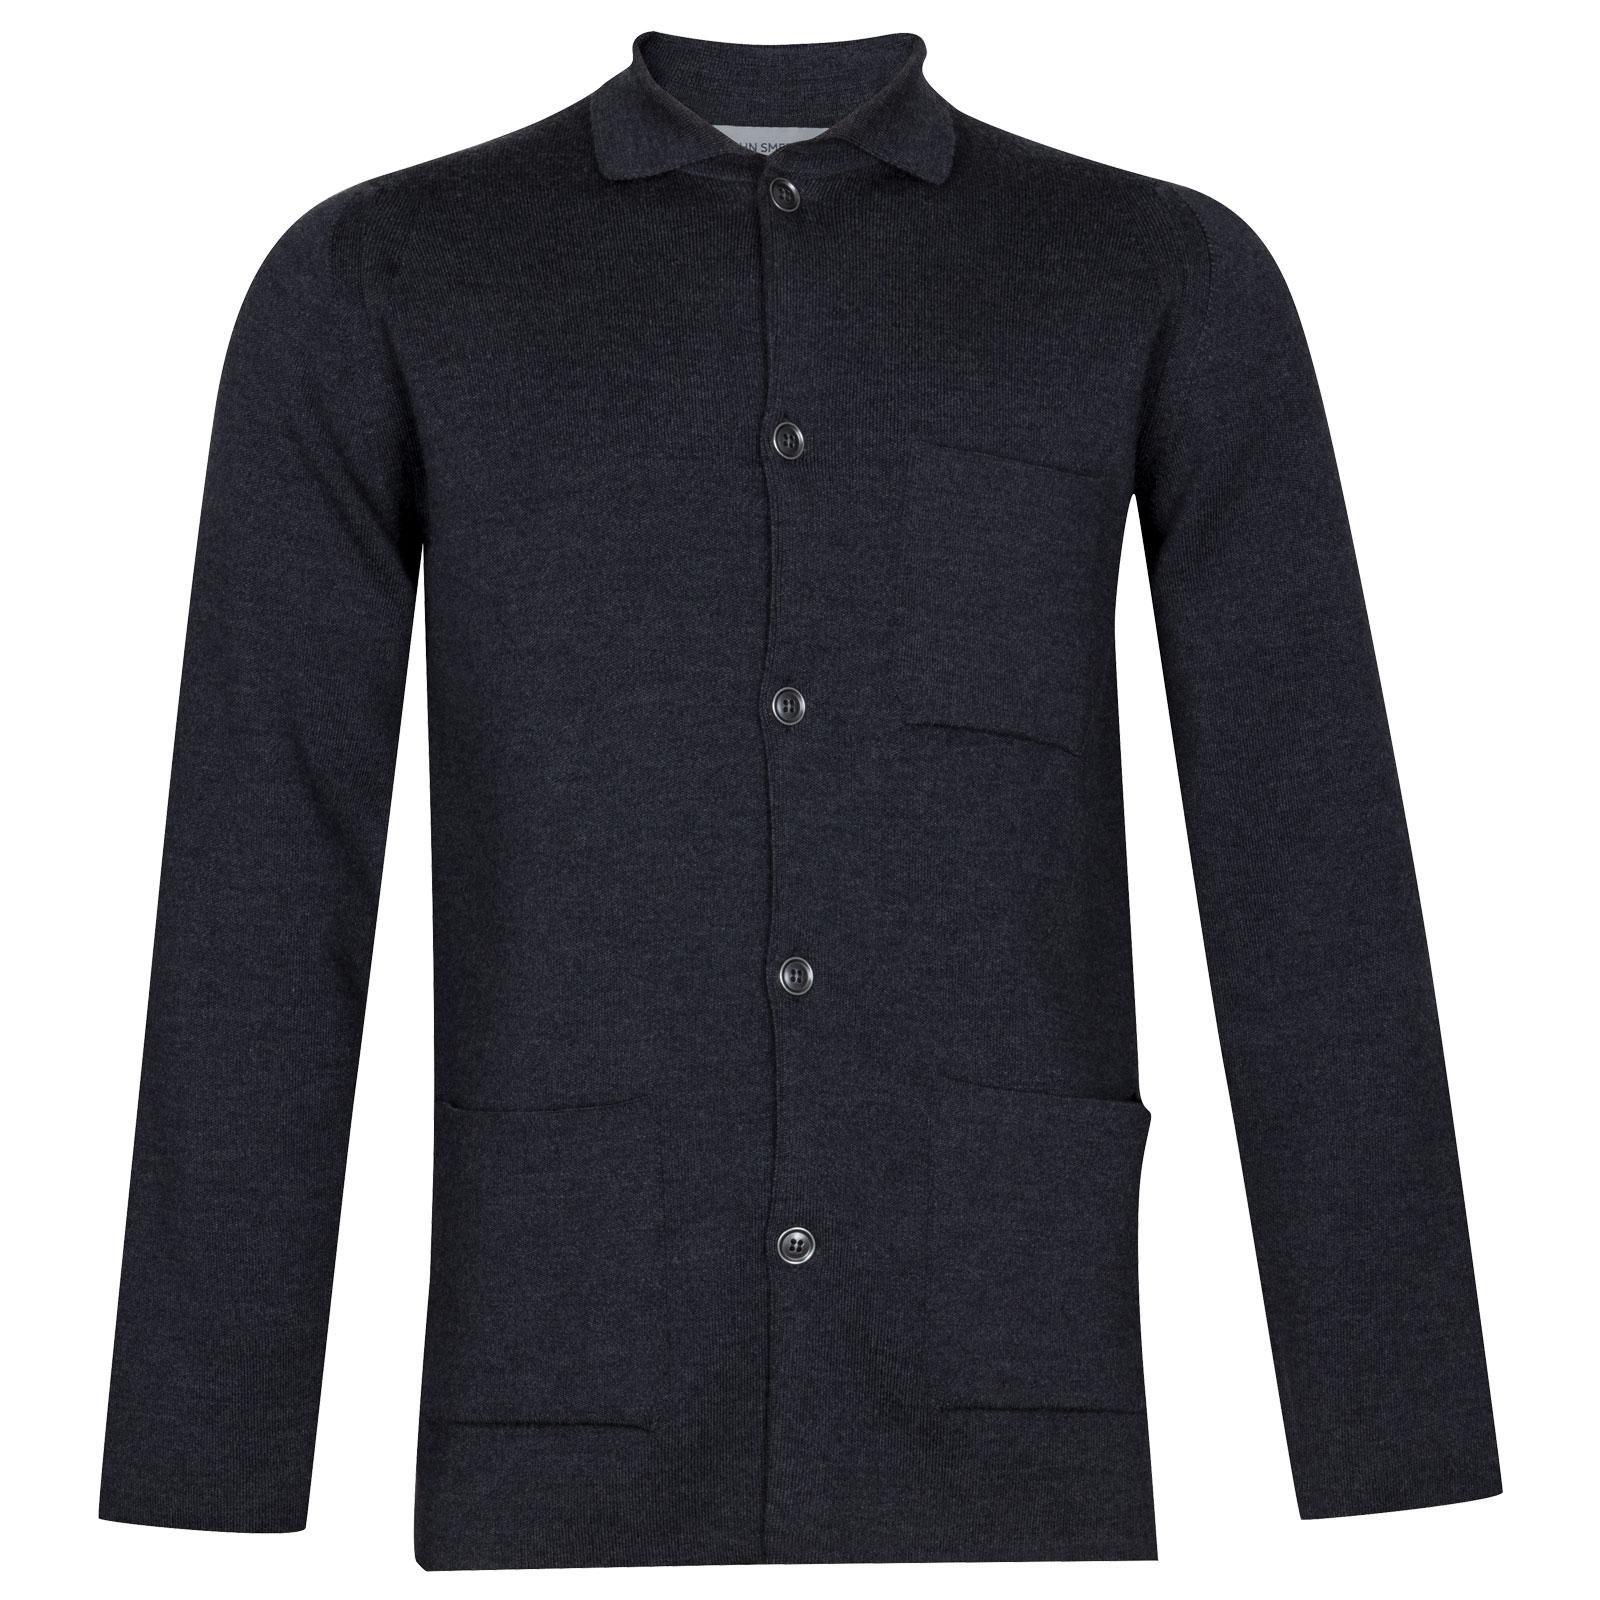 John Smedley Copper Merino Wool Jacket in Charcoal-M